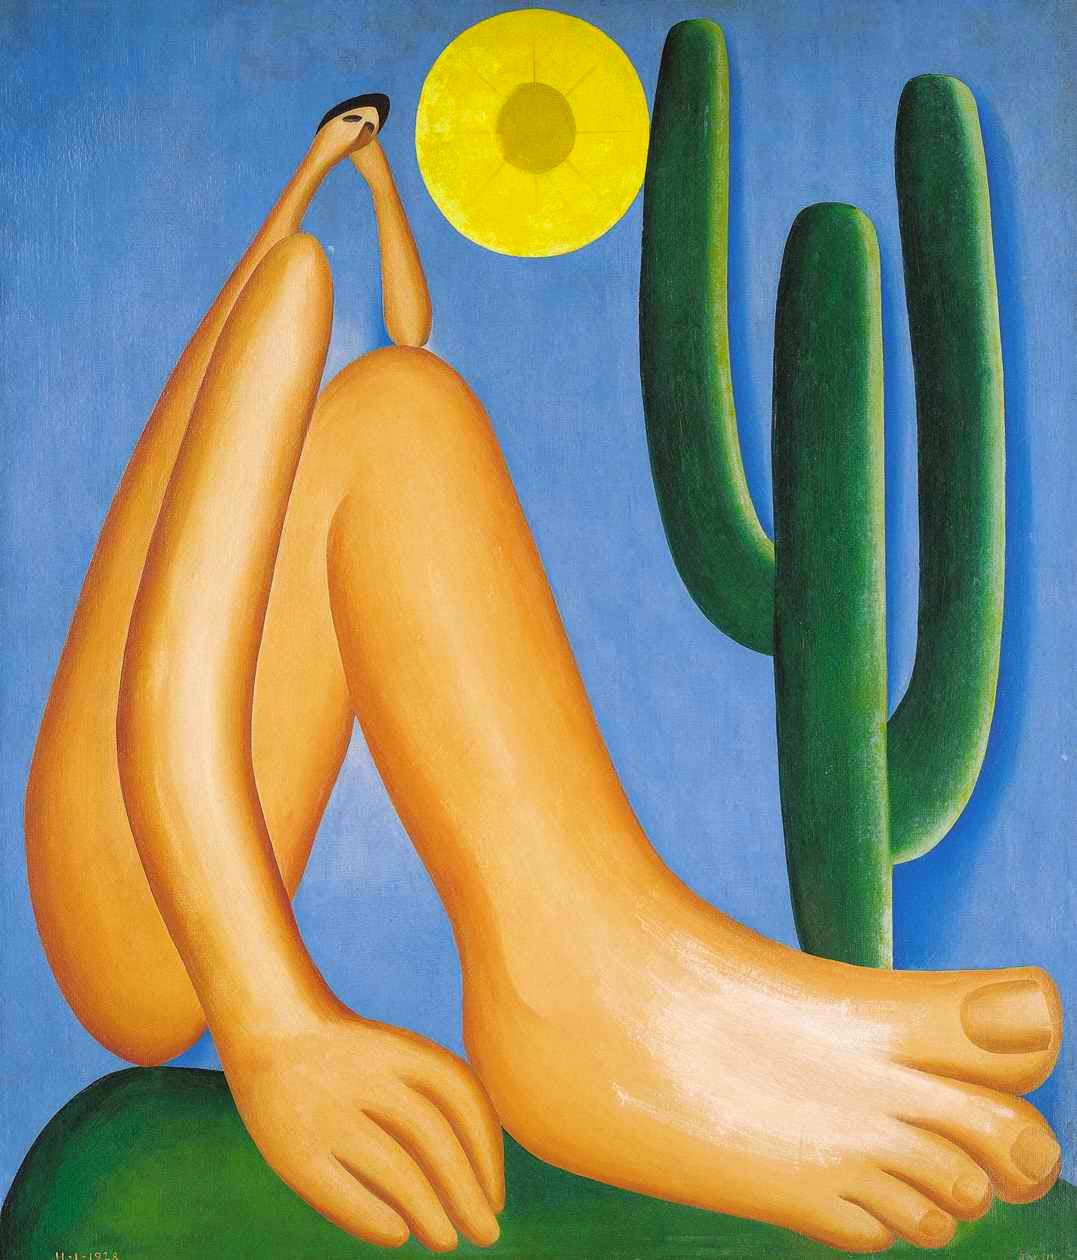 Pintura Abaporu de Tarsila do Amaral